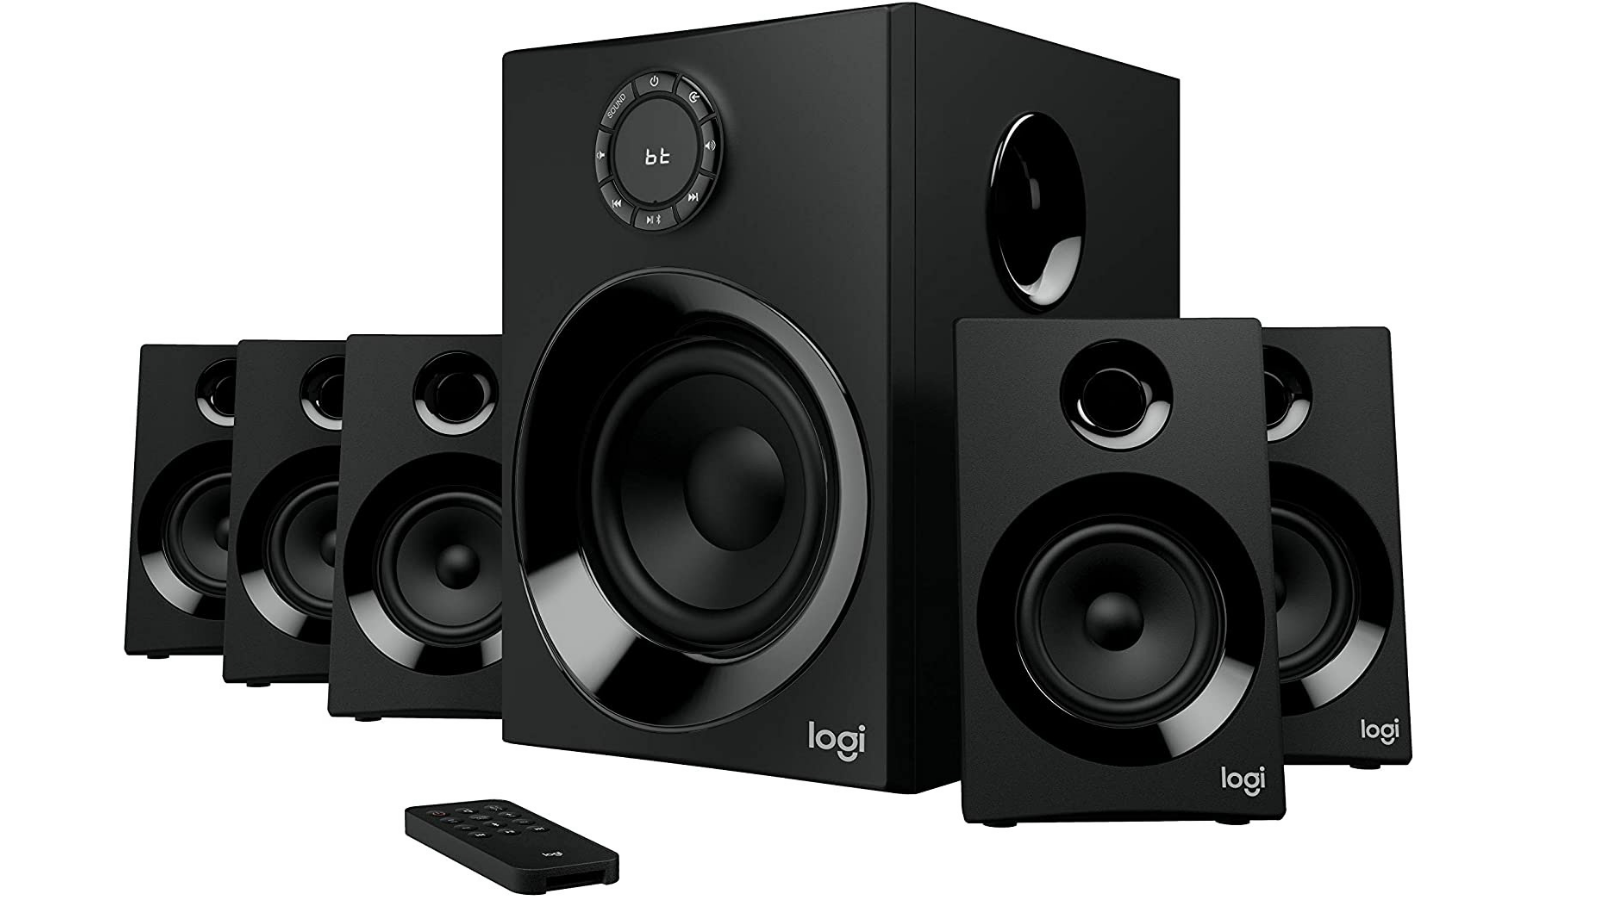 deal on Logitech Z906 5.1 Surround Sound Speaker System